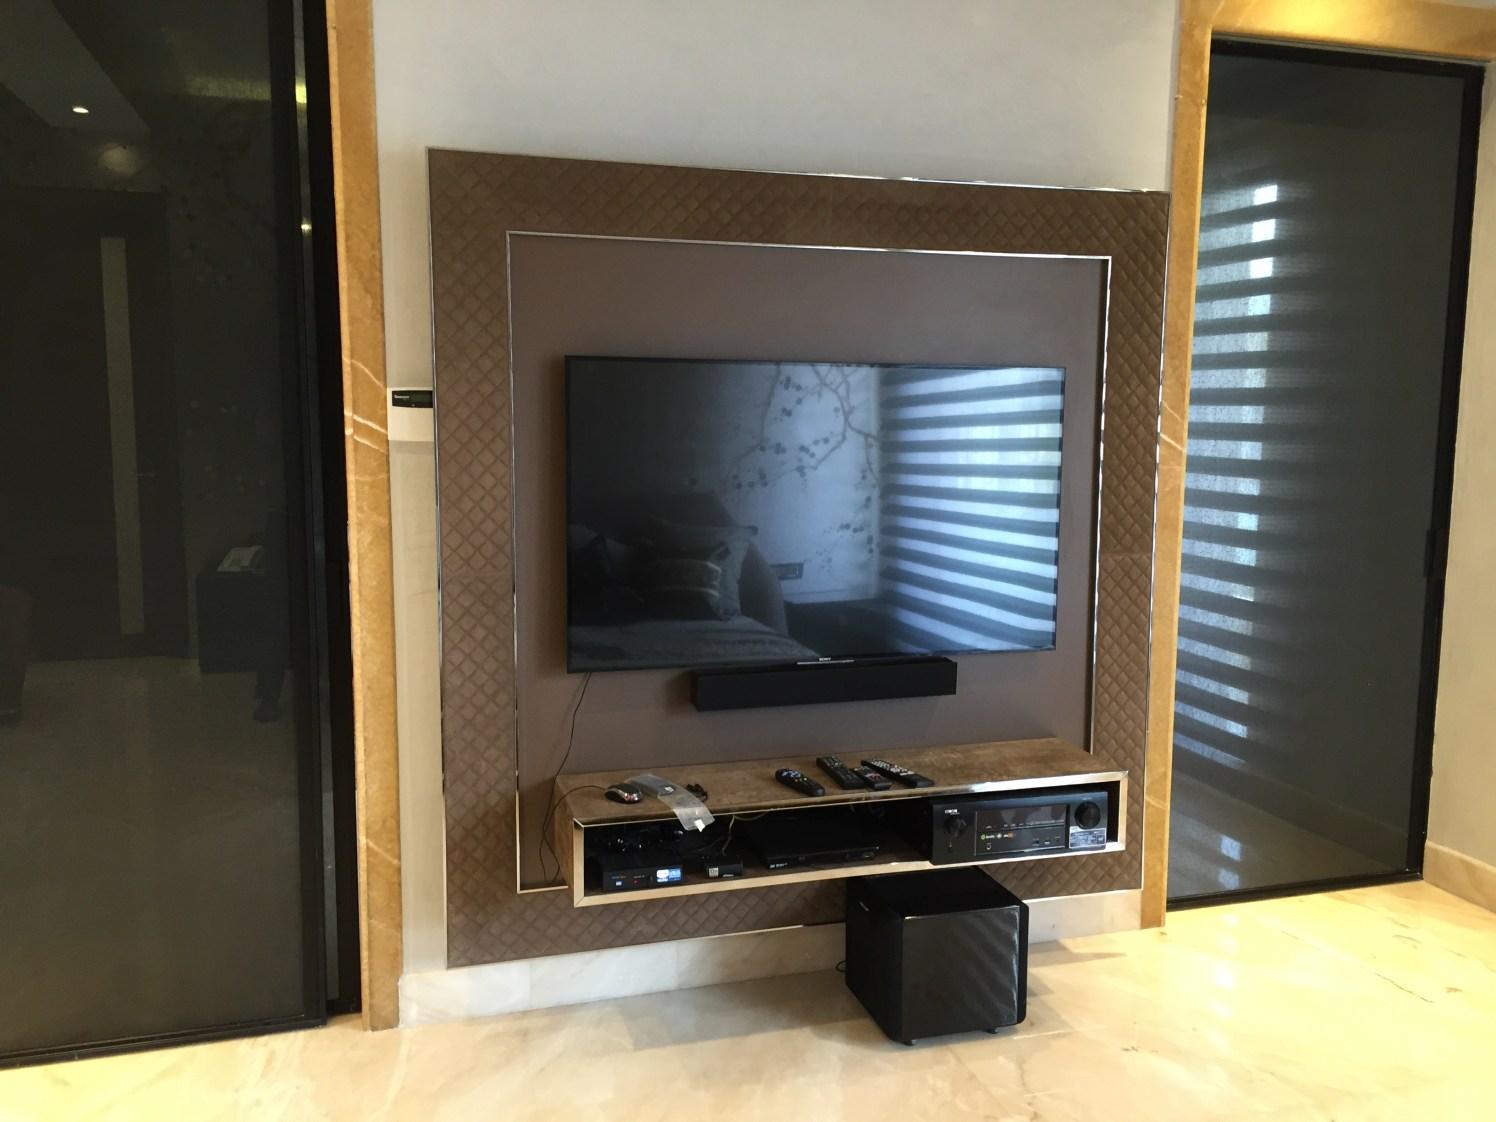 Wall Mounted TV Cabinet by Tarique Anwar Living-room Contemporary | Interior Design Photos & Ideas